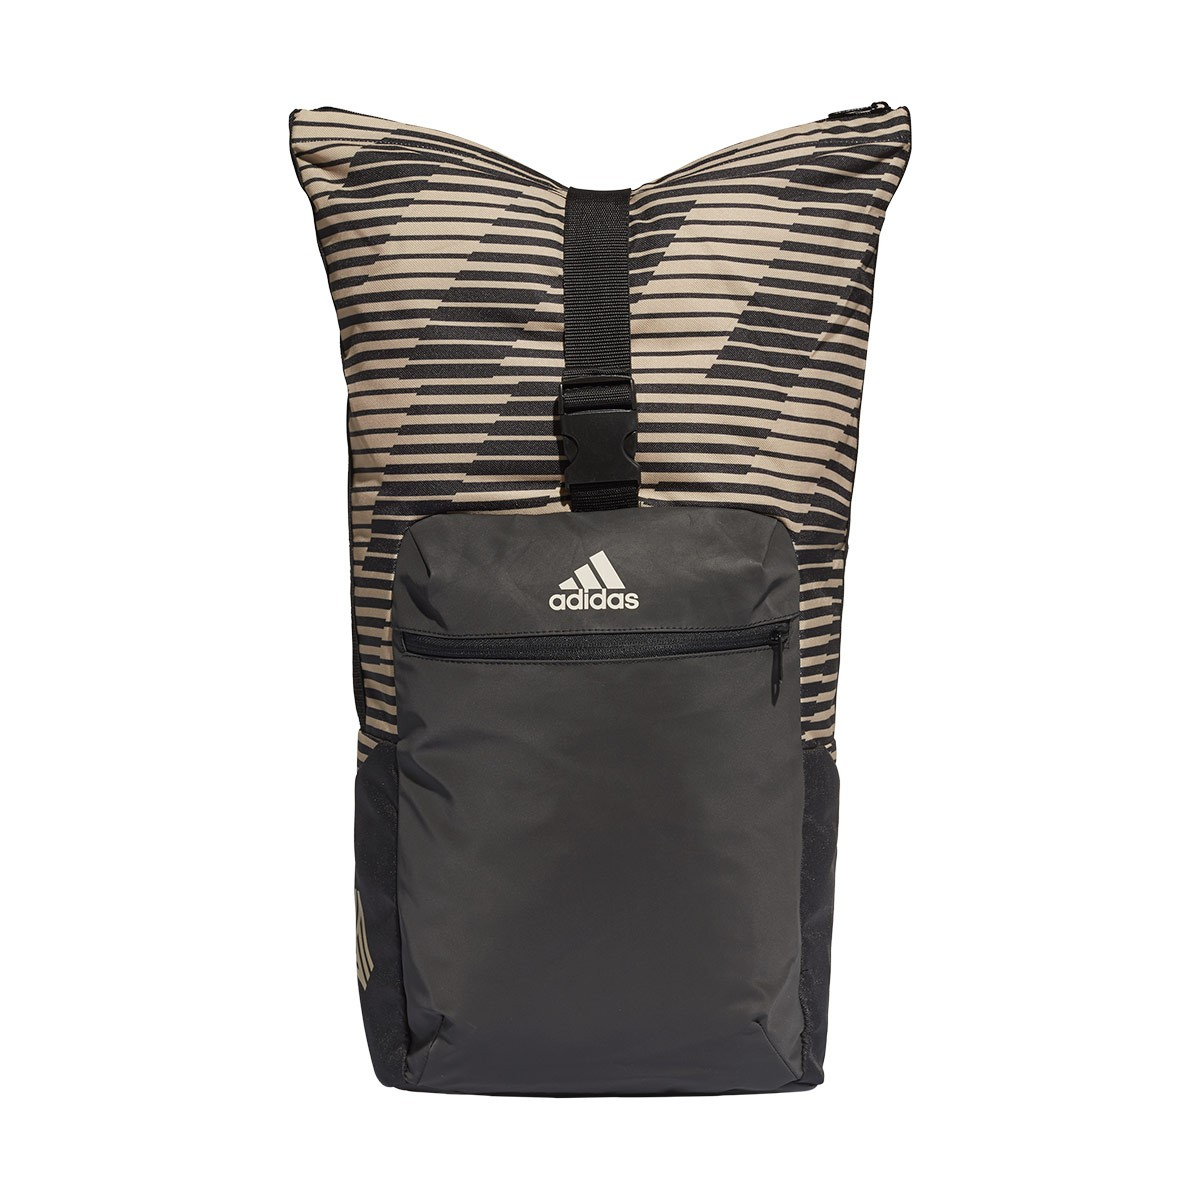 c2e5a89713de6 Backpack adidas FS BP Black-Raw gold - Football store Fútbol Emotion